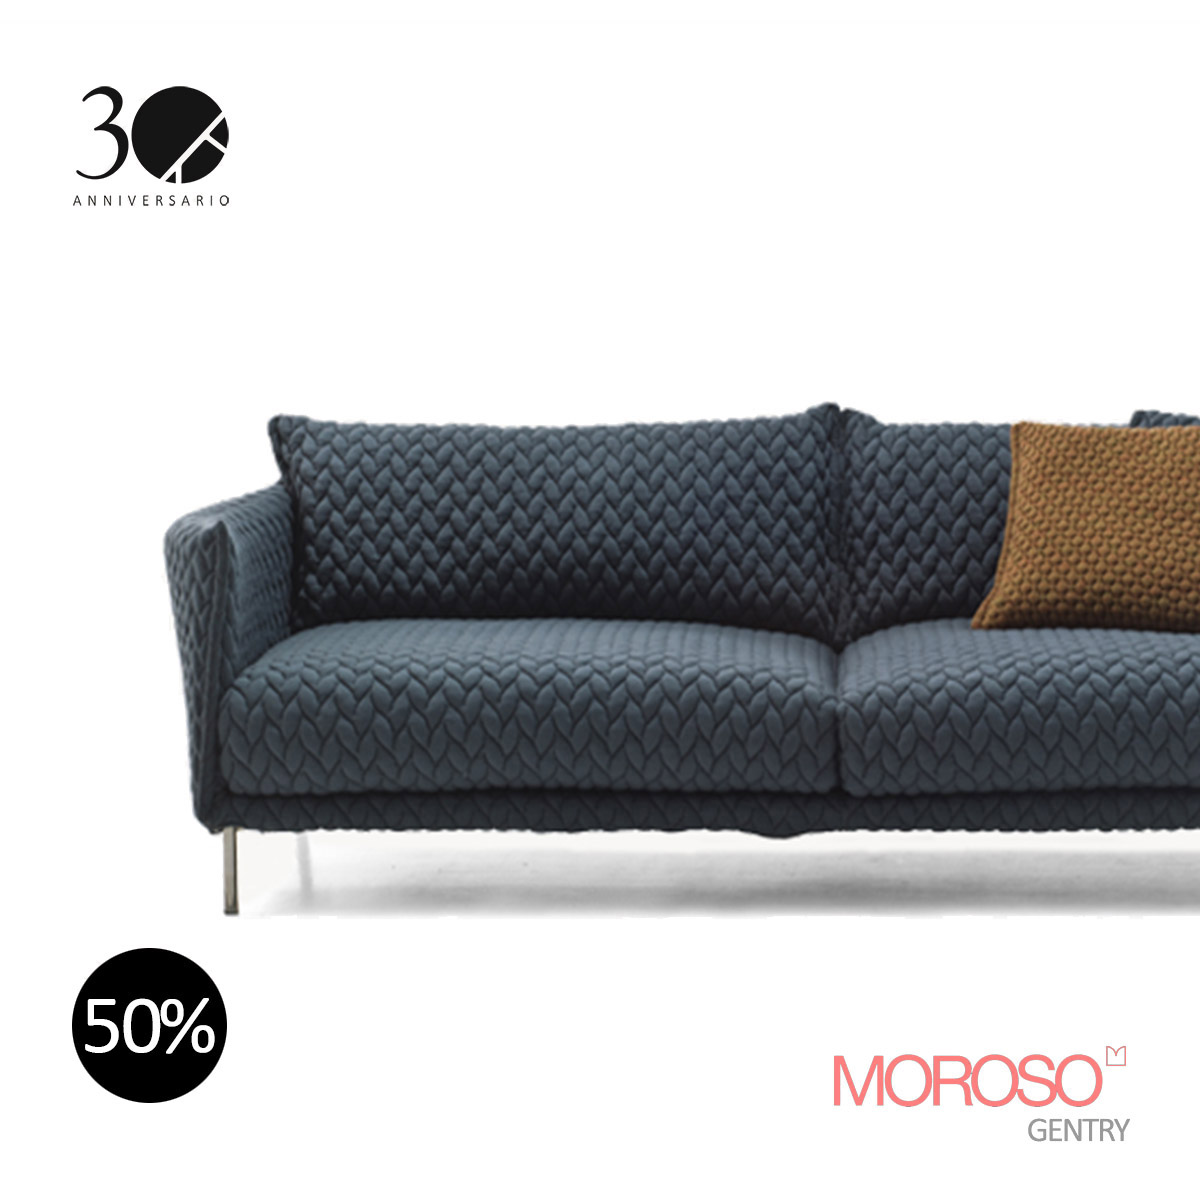 MOROSO - GENTRY